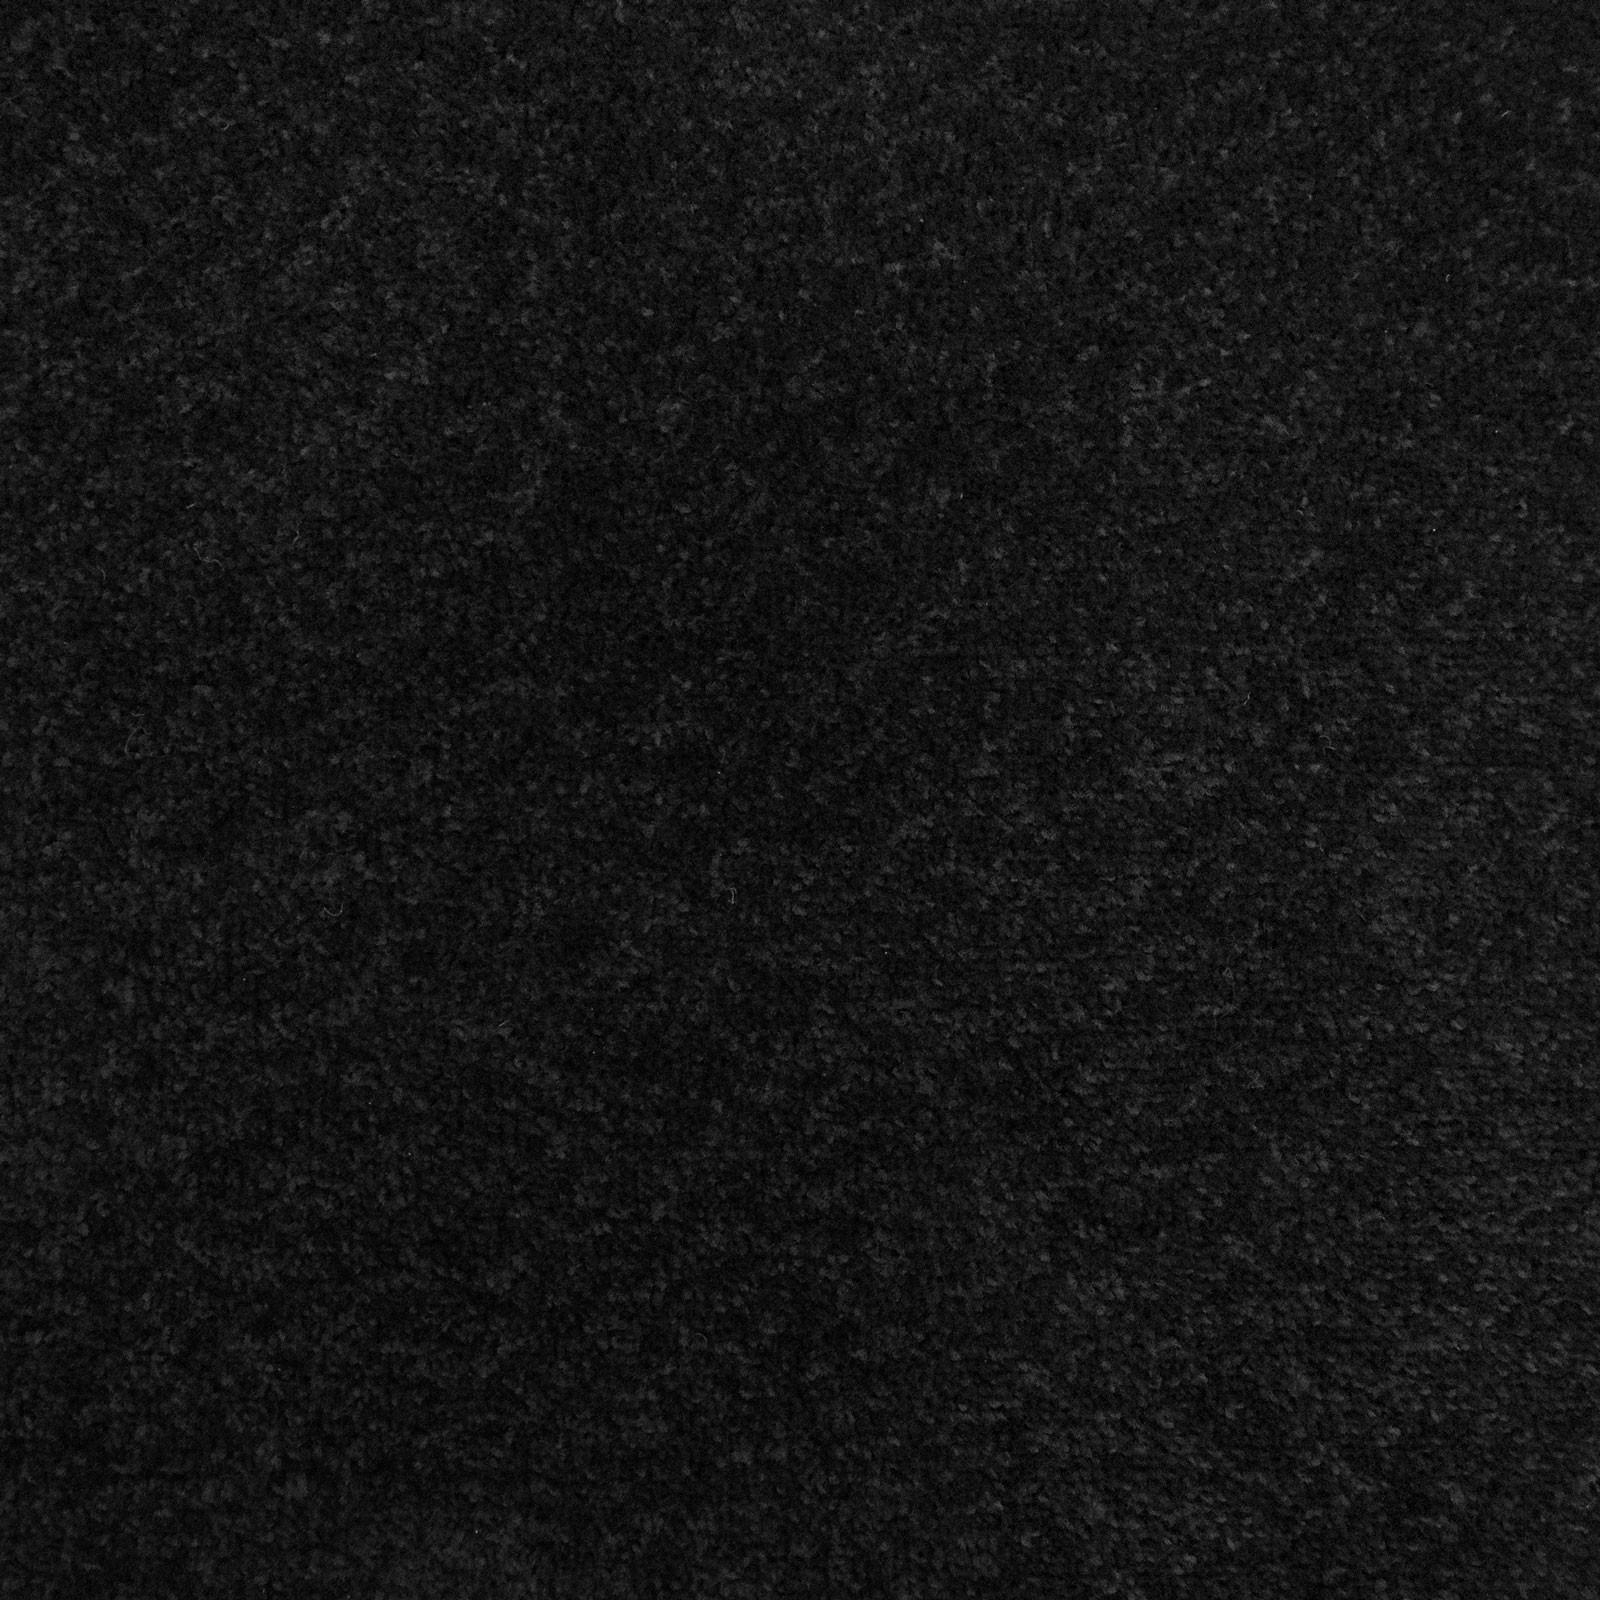 Aisle Runner Black Carpet Encore Events